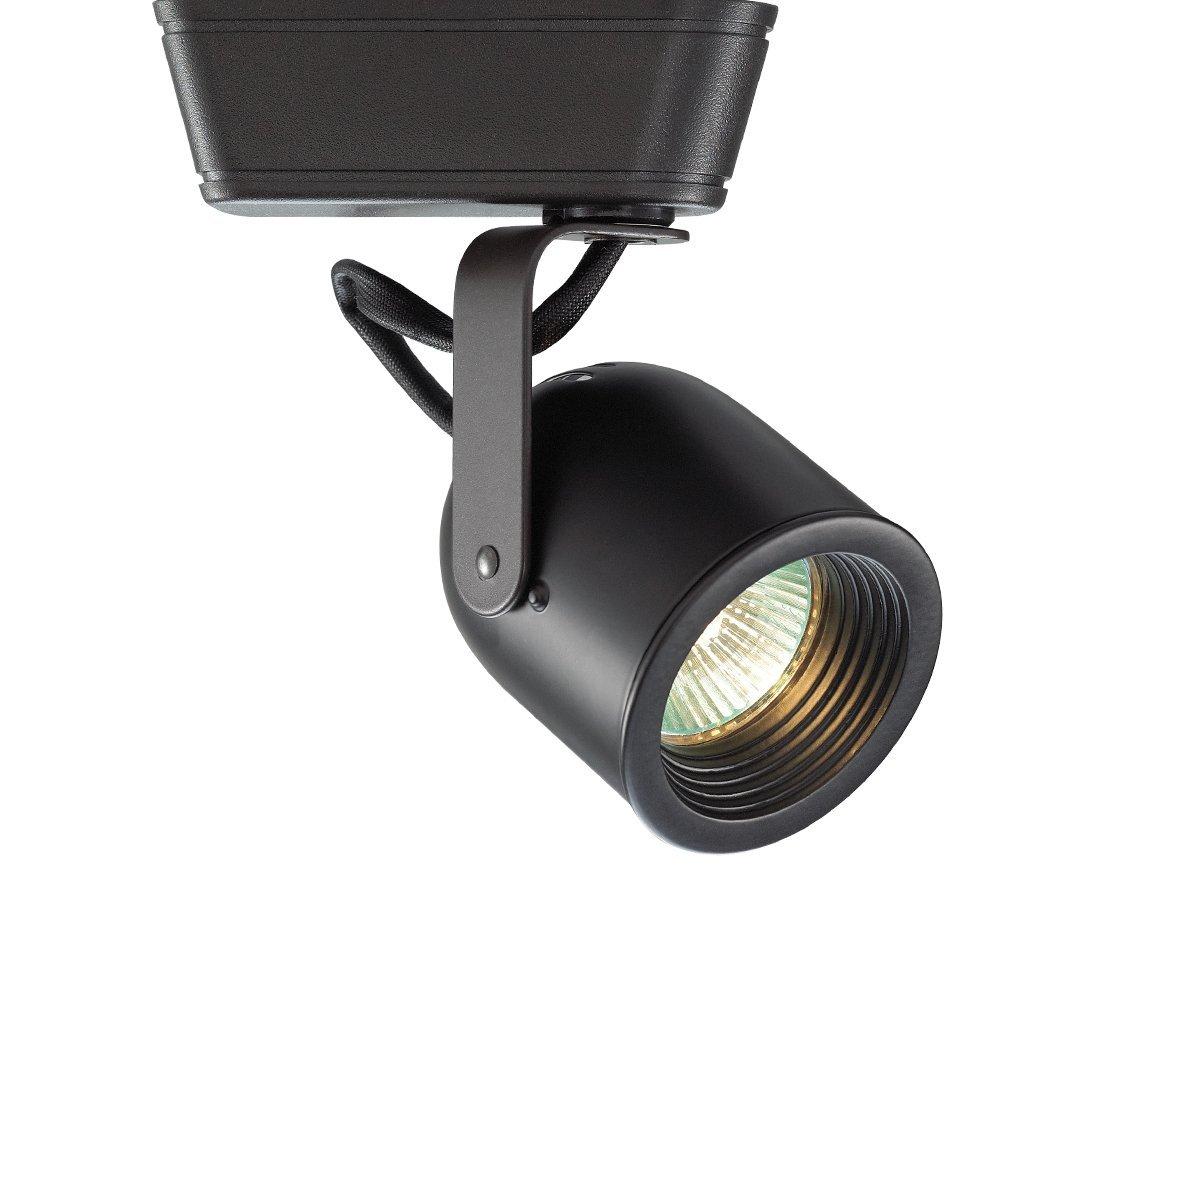 WAC Lighting HHT-808-WT H Series Low Voltage Track Head 50W - - Amazon.com  sc 1 st  Amazon.com & WAC Lighting HHT-808-WT H Series Low Voltage Track Head 50W ... azcodes.com